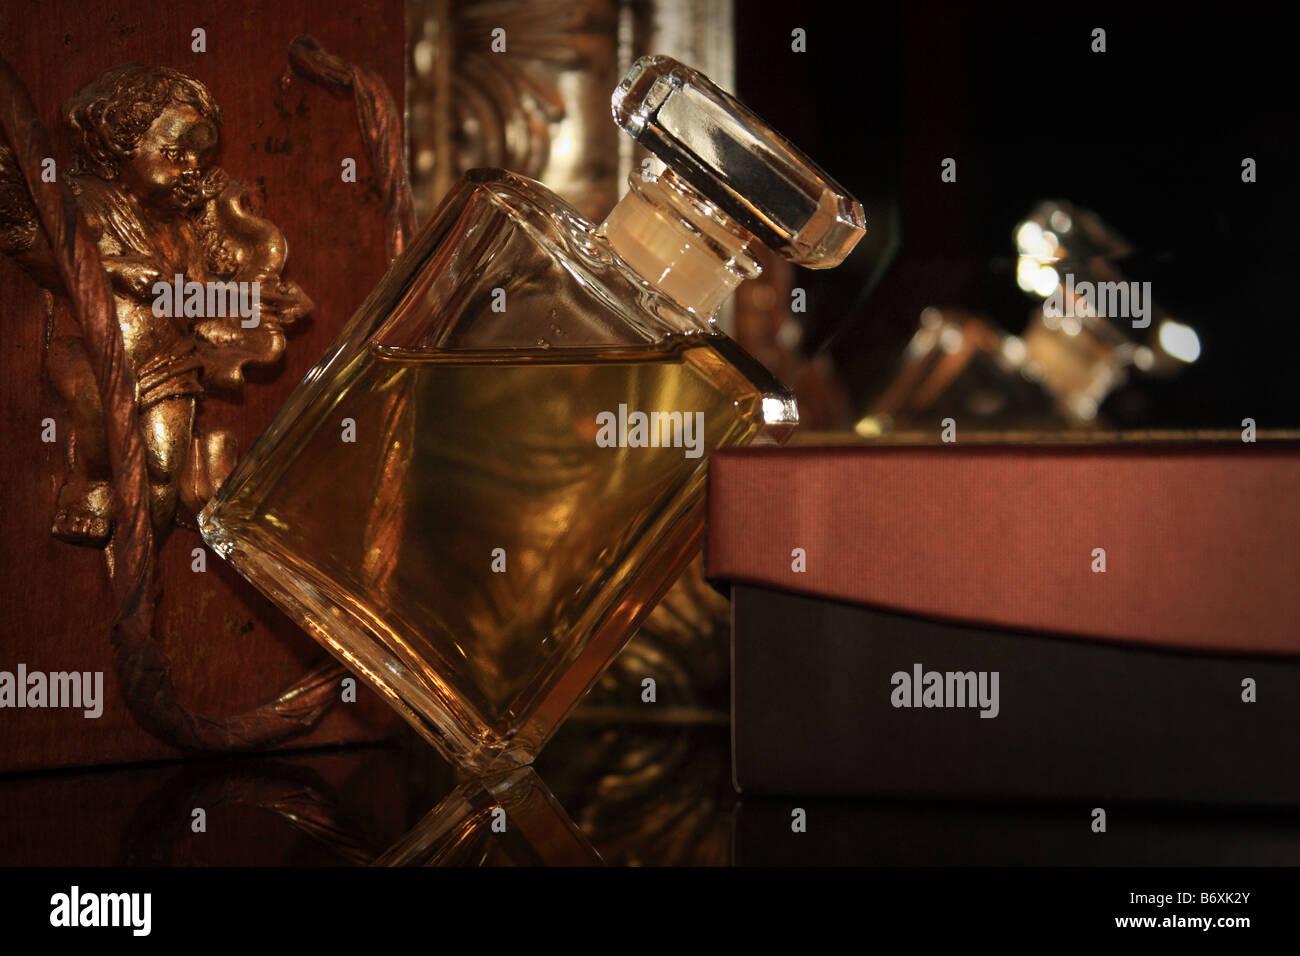 Perfume bottle - Stock Image